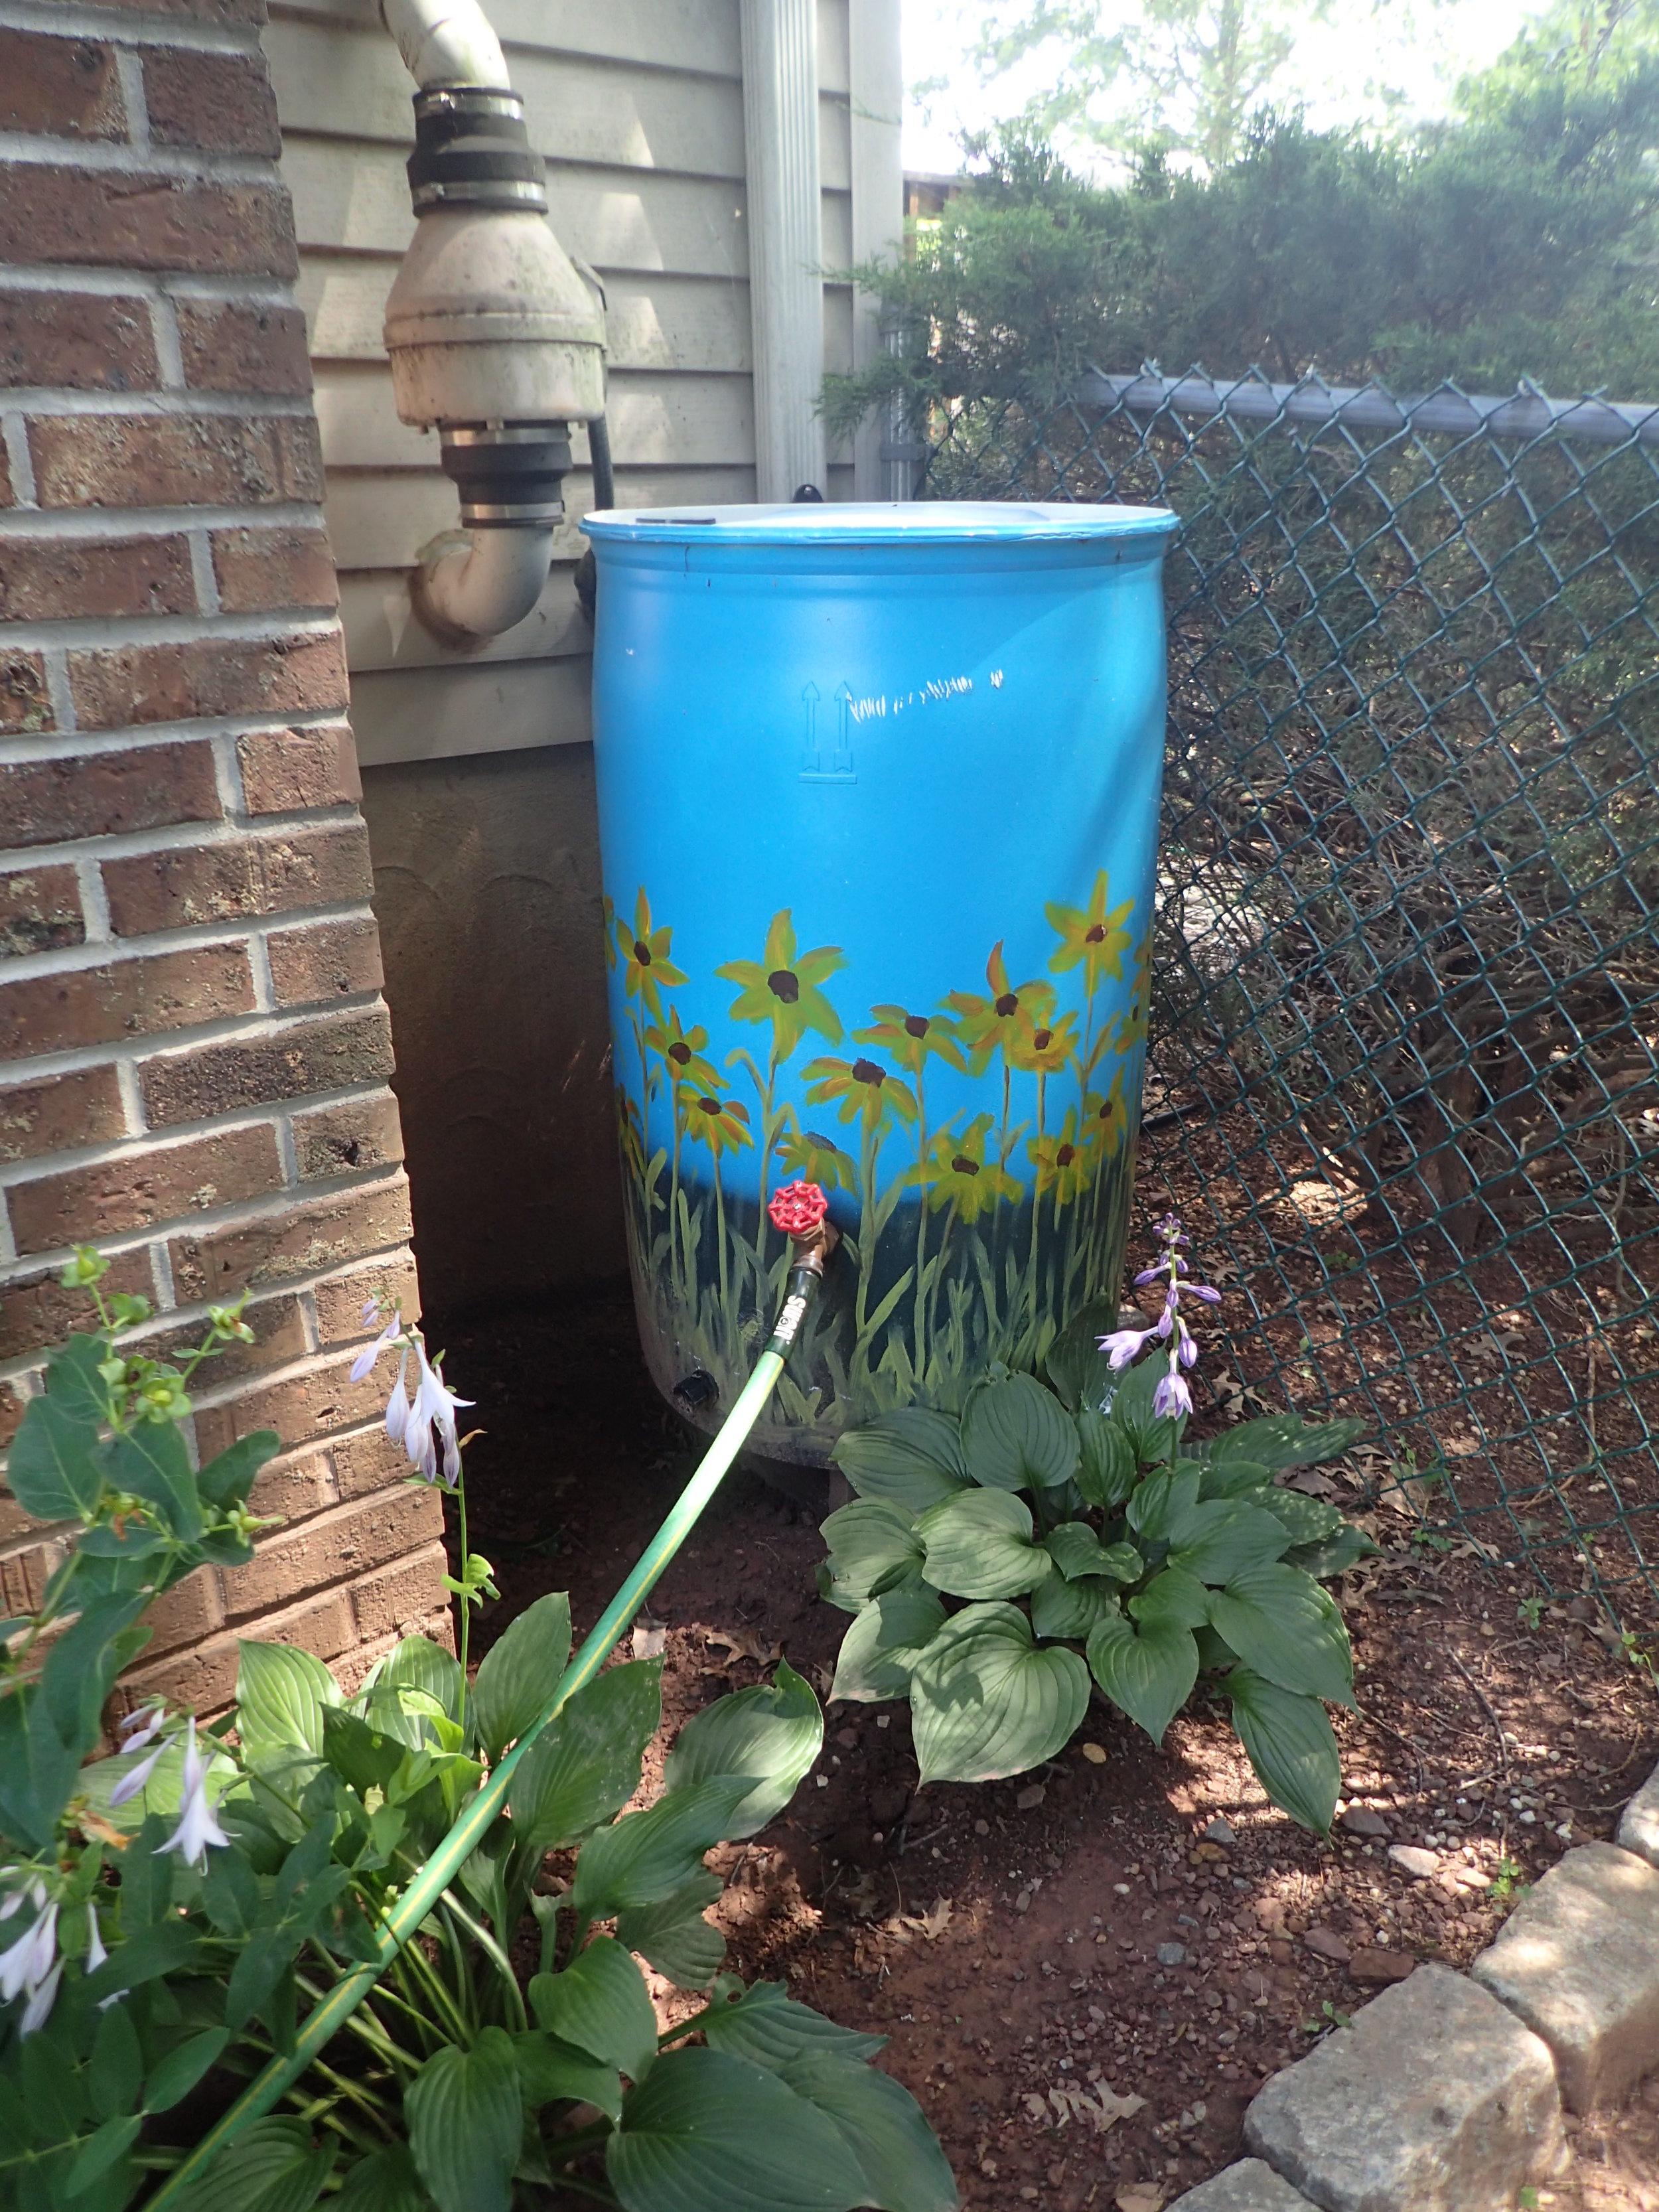 Install a rain barrel and get money back!